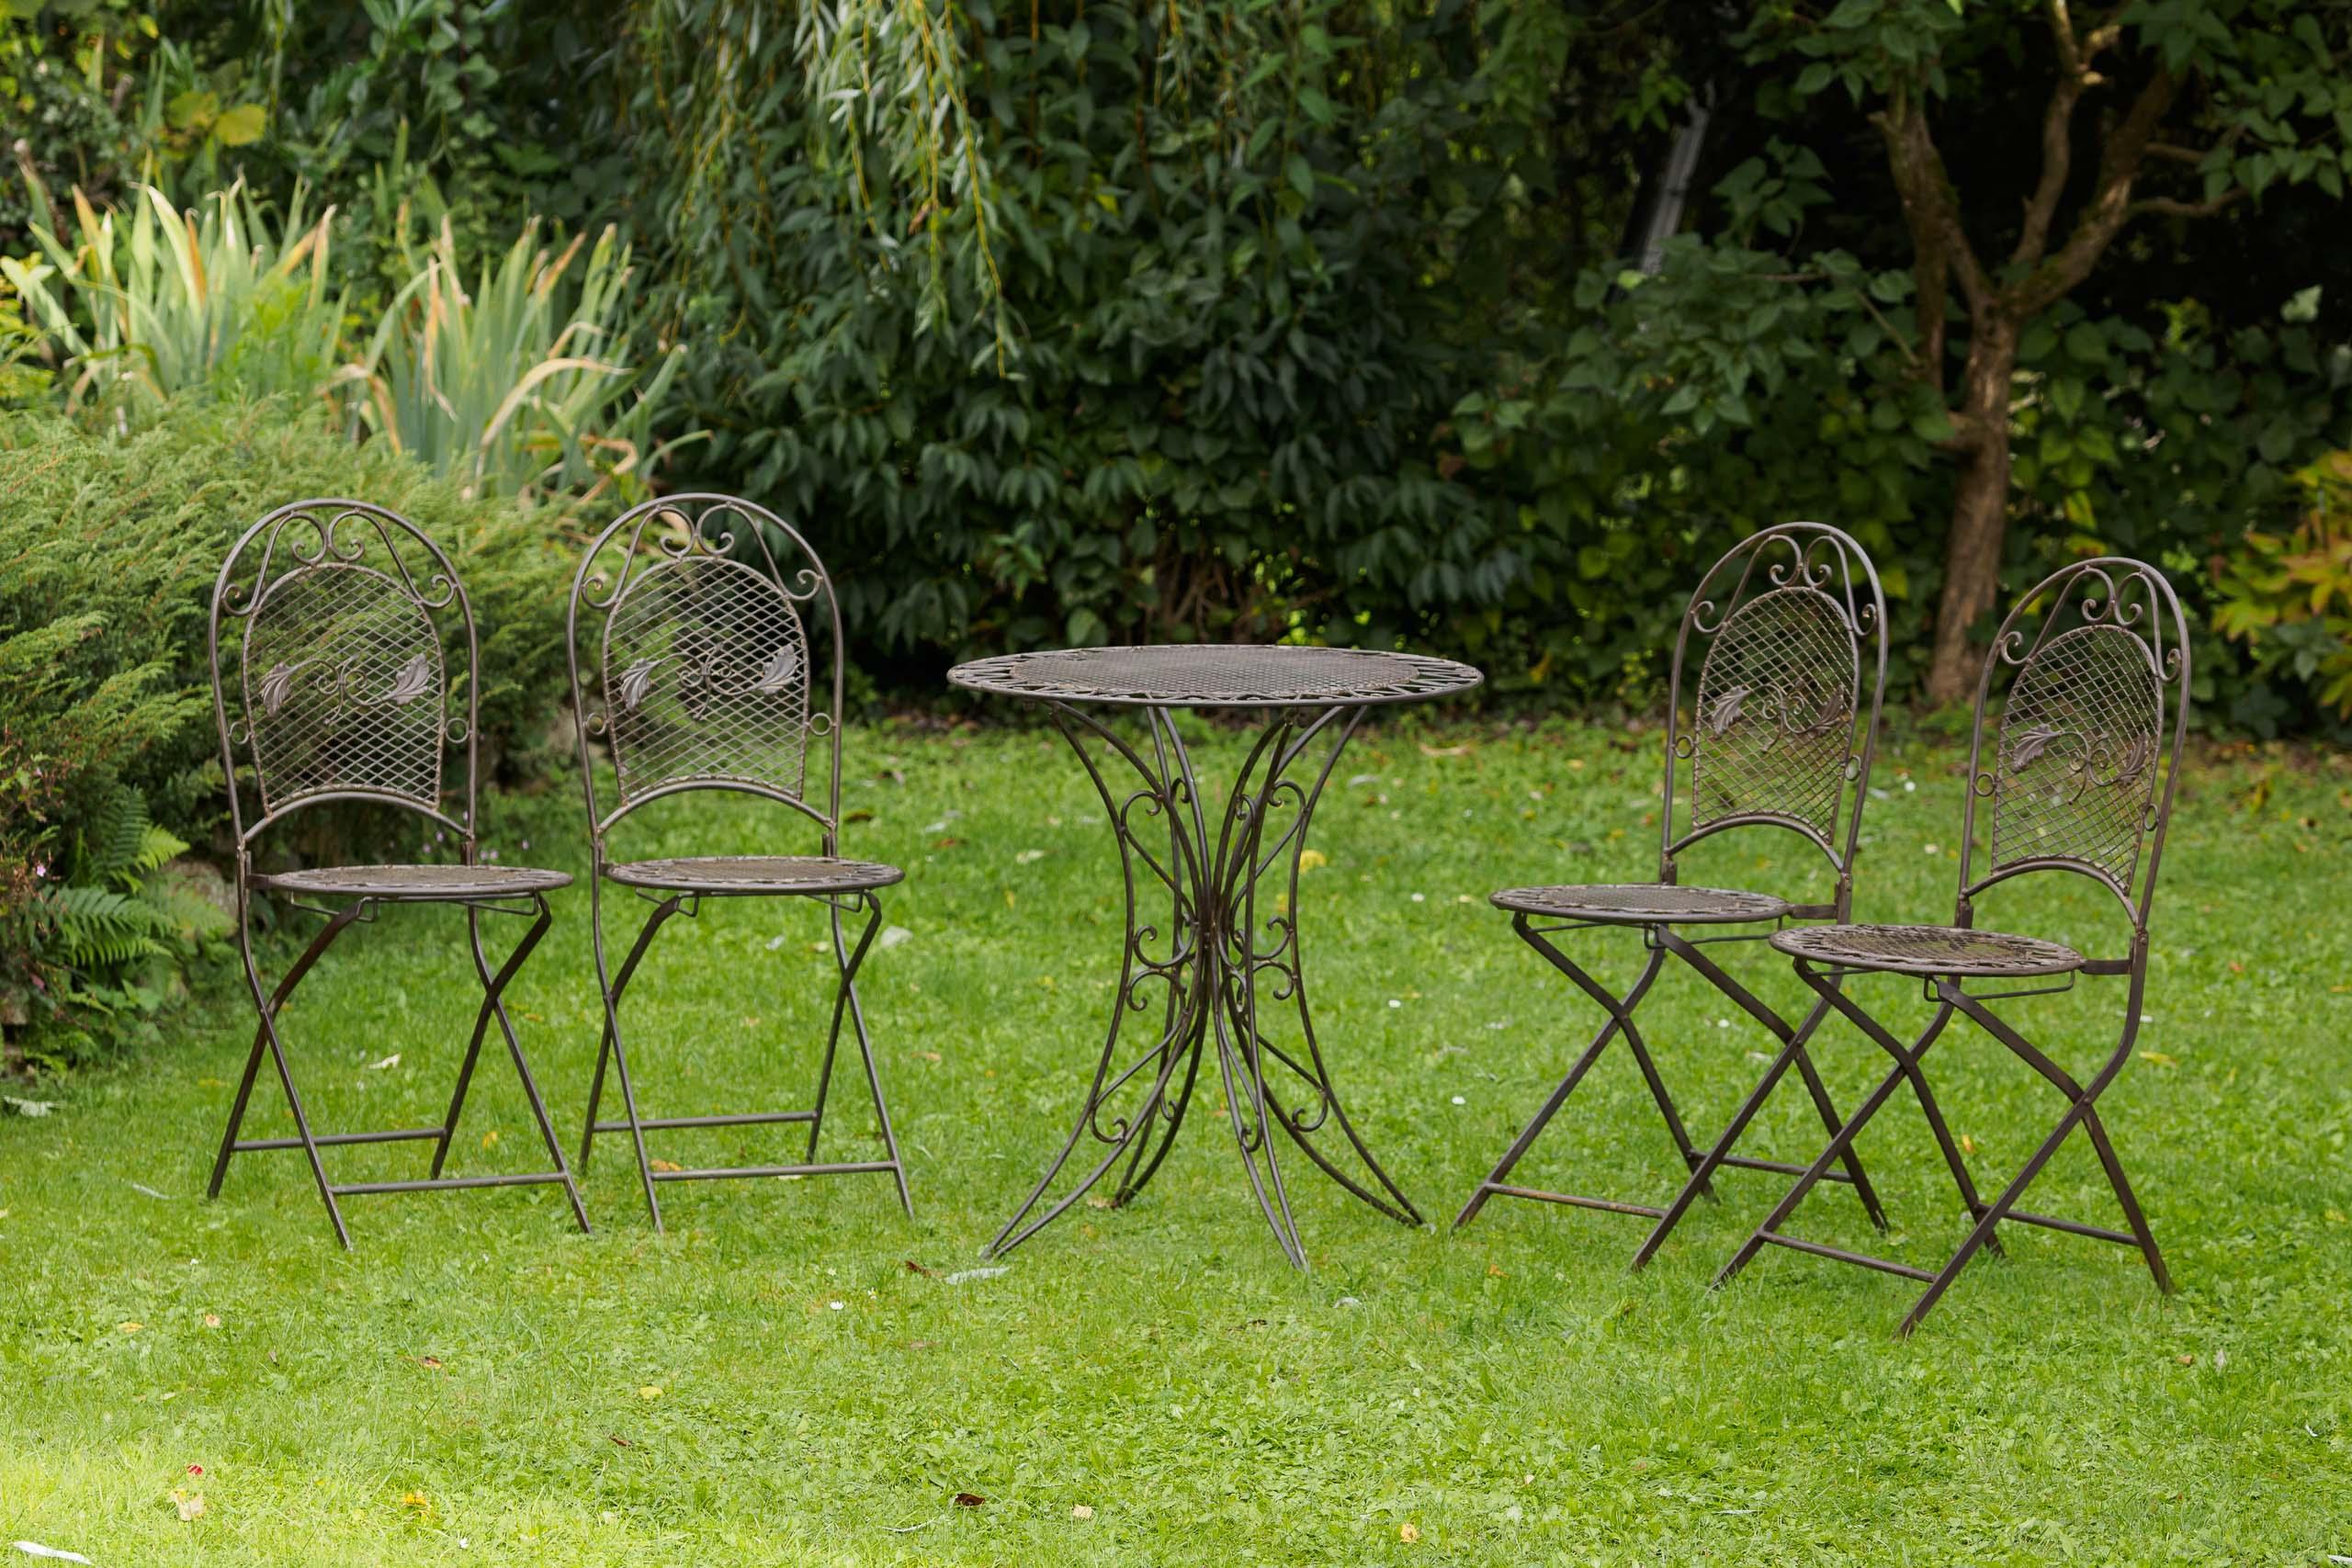 Set Giardino In Ferro Battuto.Set Tavolo Da Giardino 4 Sedie In Ferro Battuto Mobili Da Giardino